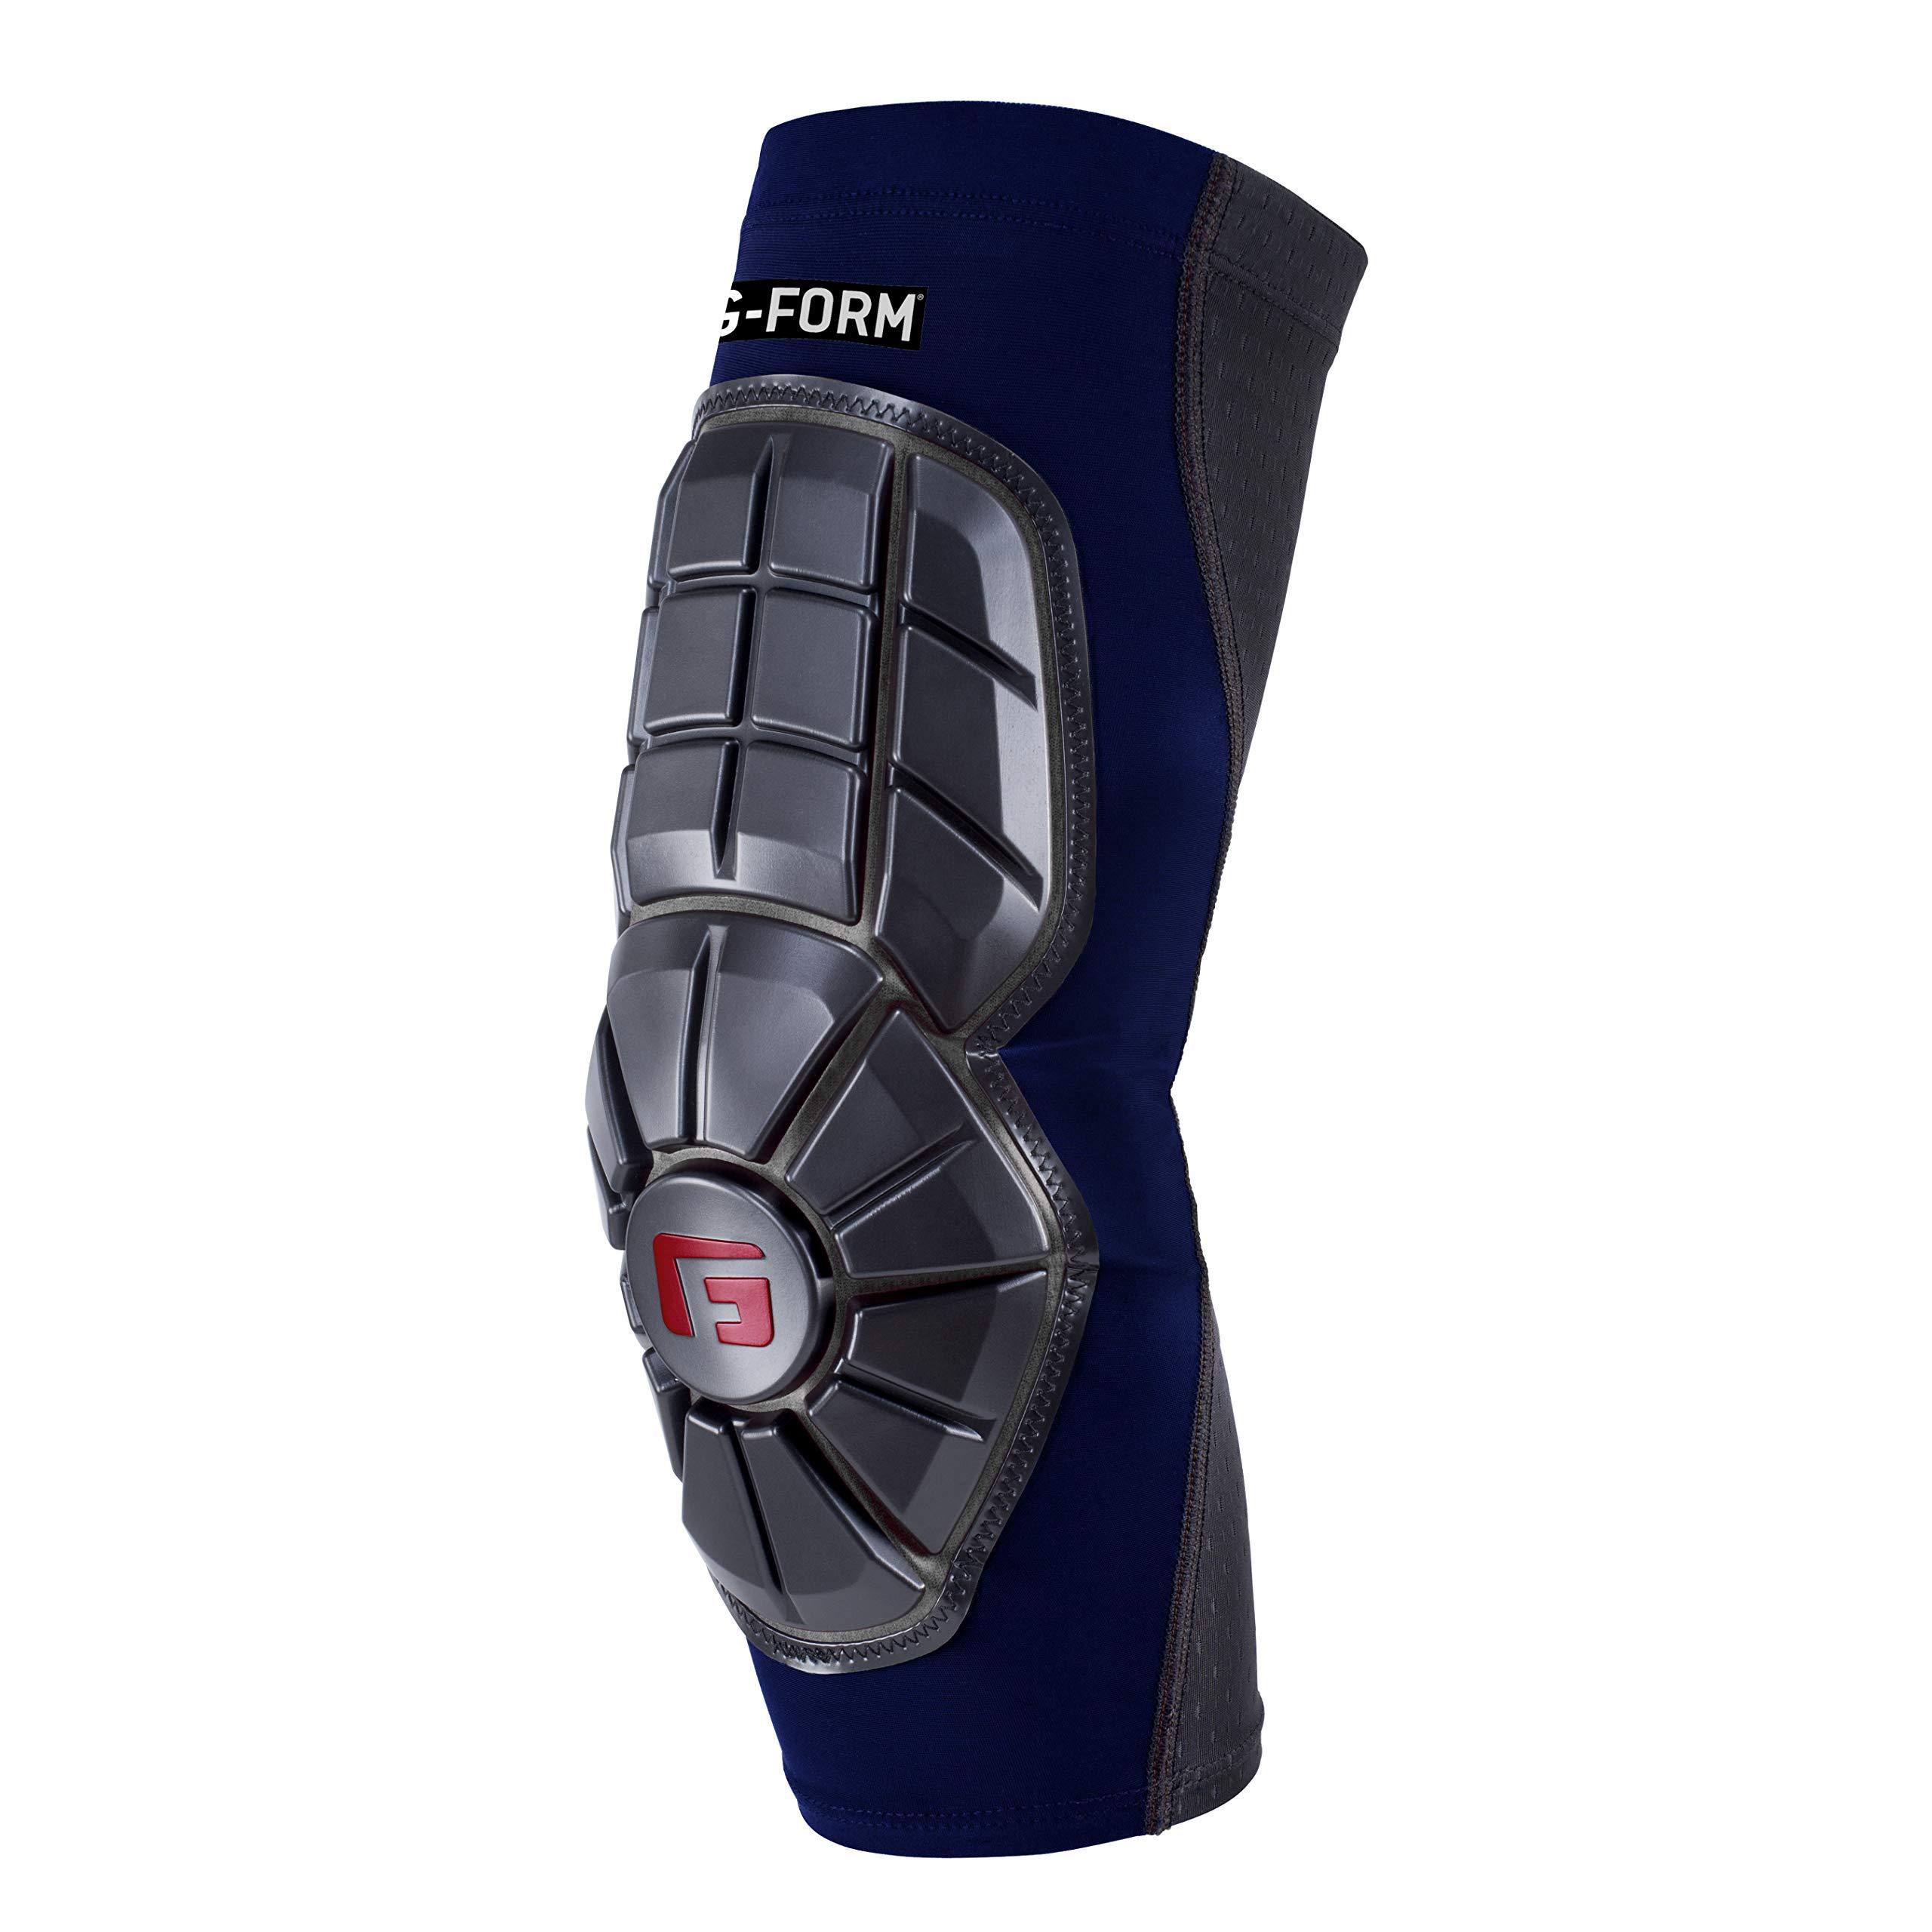 G-Form Pro Extended Elbow Guard, Navy Blue/Black, Adult Medium